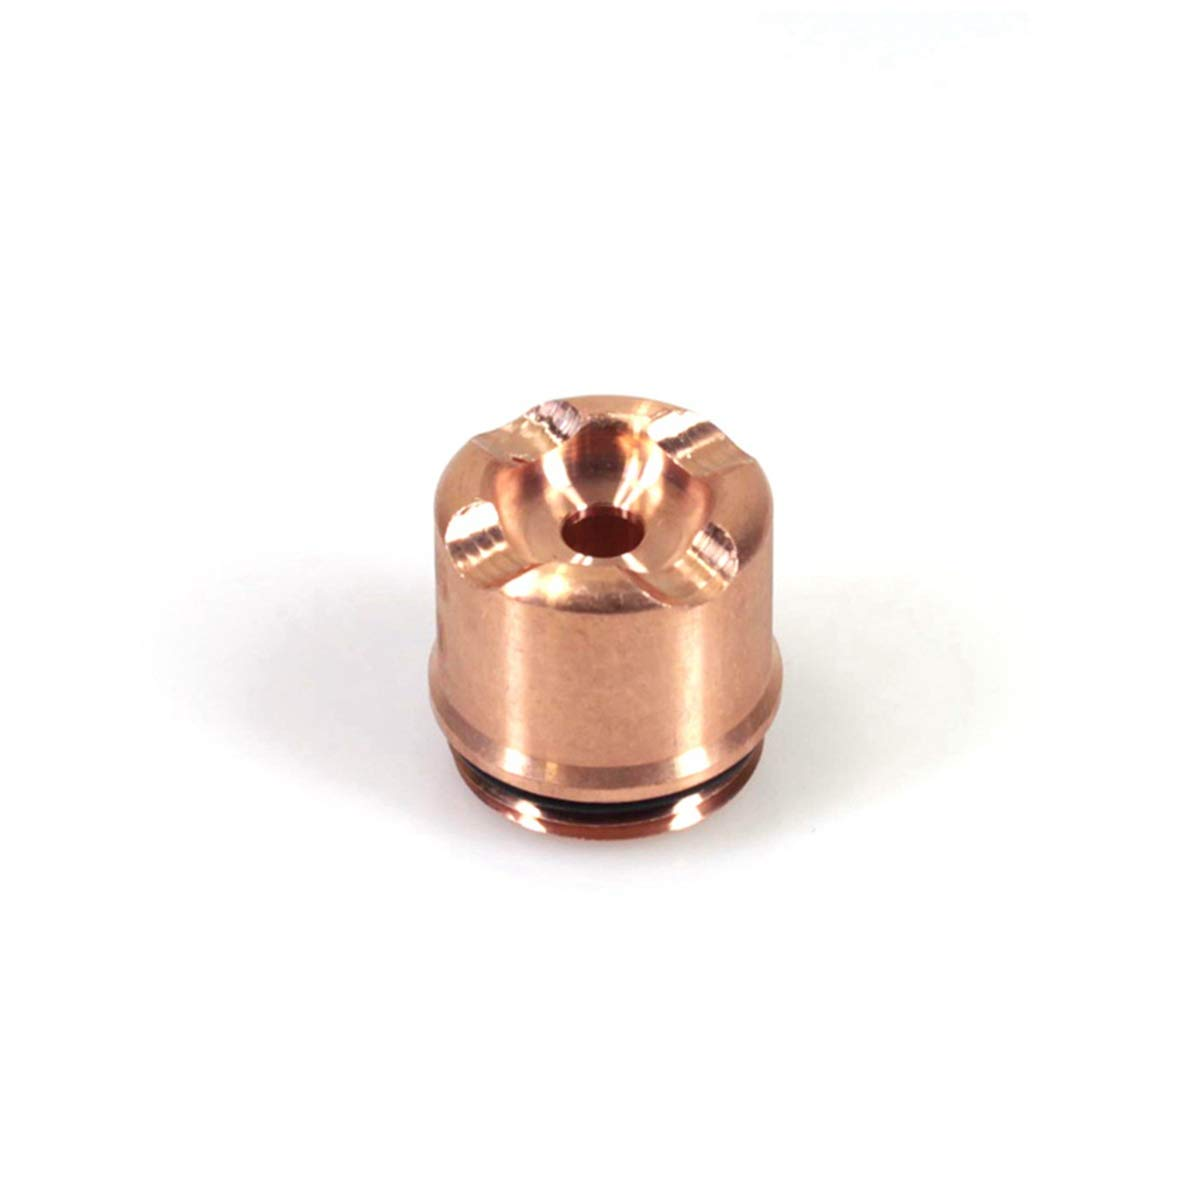 9-8237 Plasma Shield Cup Original 9-8235 Drag Shield Cup for Thermal Dynamics SL60 /& 100 Torch 6pcs